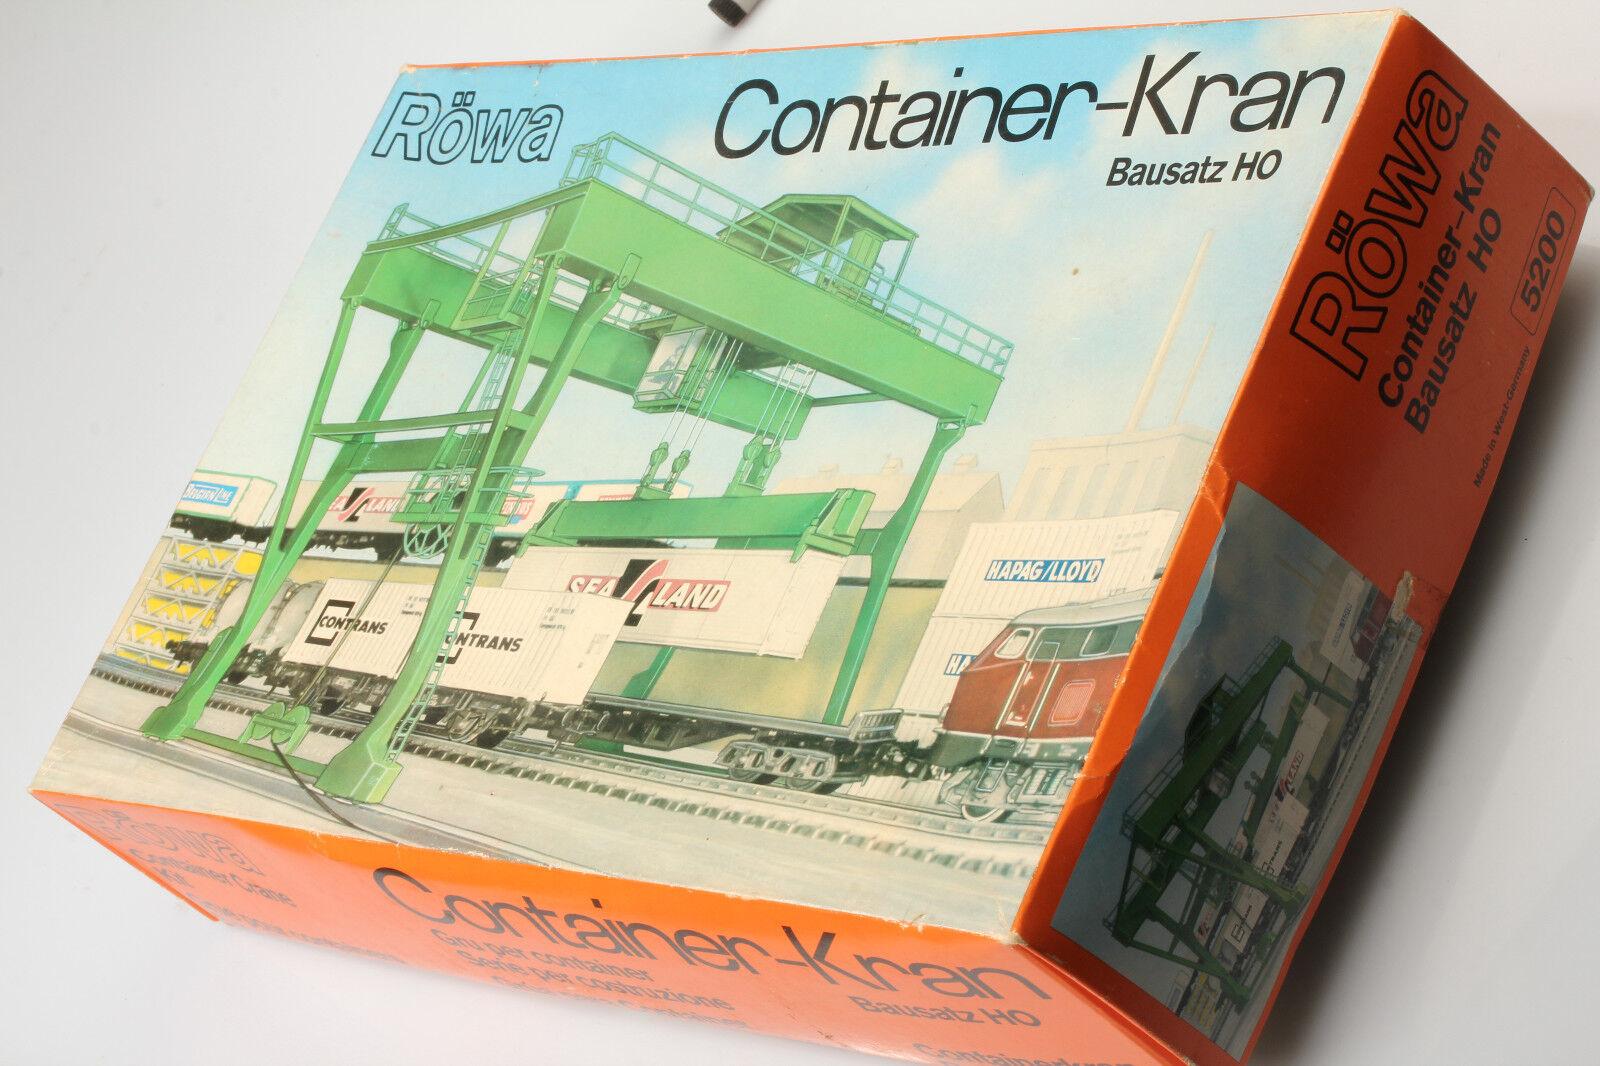 H0 Röwa 5200 Nikolaus-Rarität Container Gru Kit di Costruzione Sporco/Difetti